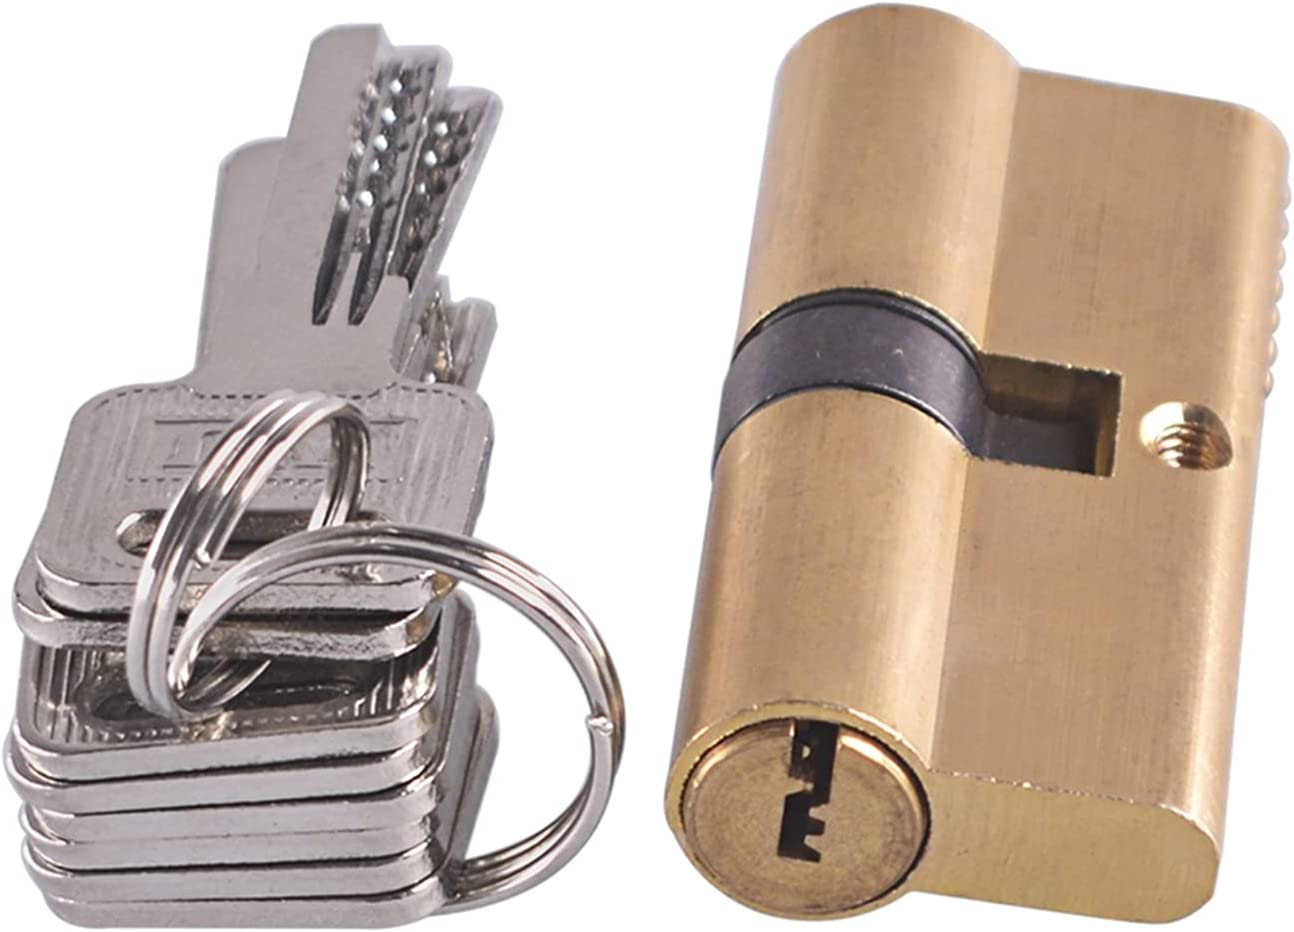 yongyundi Lock Cylinder Pure sold out Copper Core Mm 75 Award AB